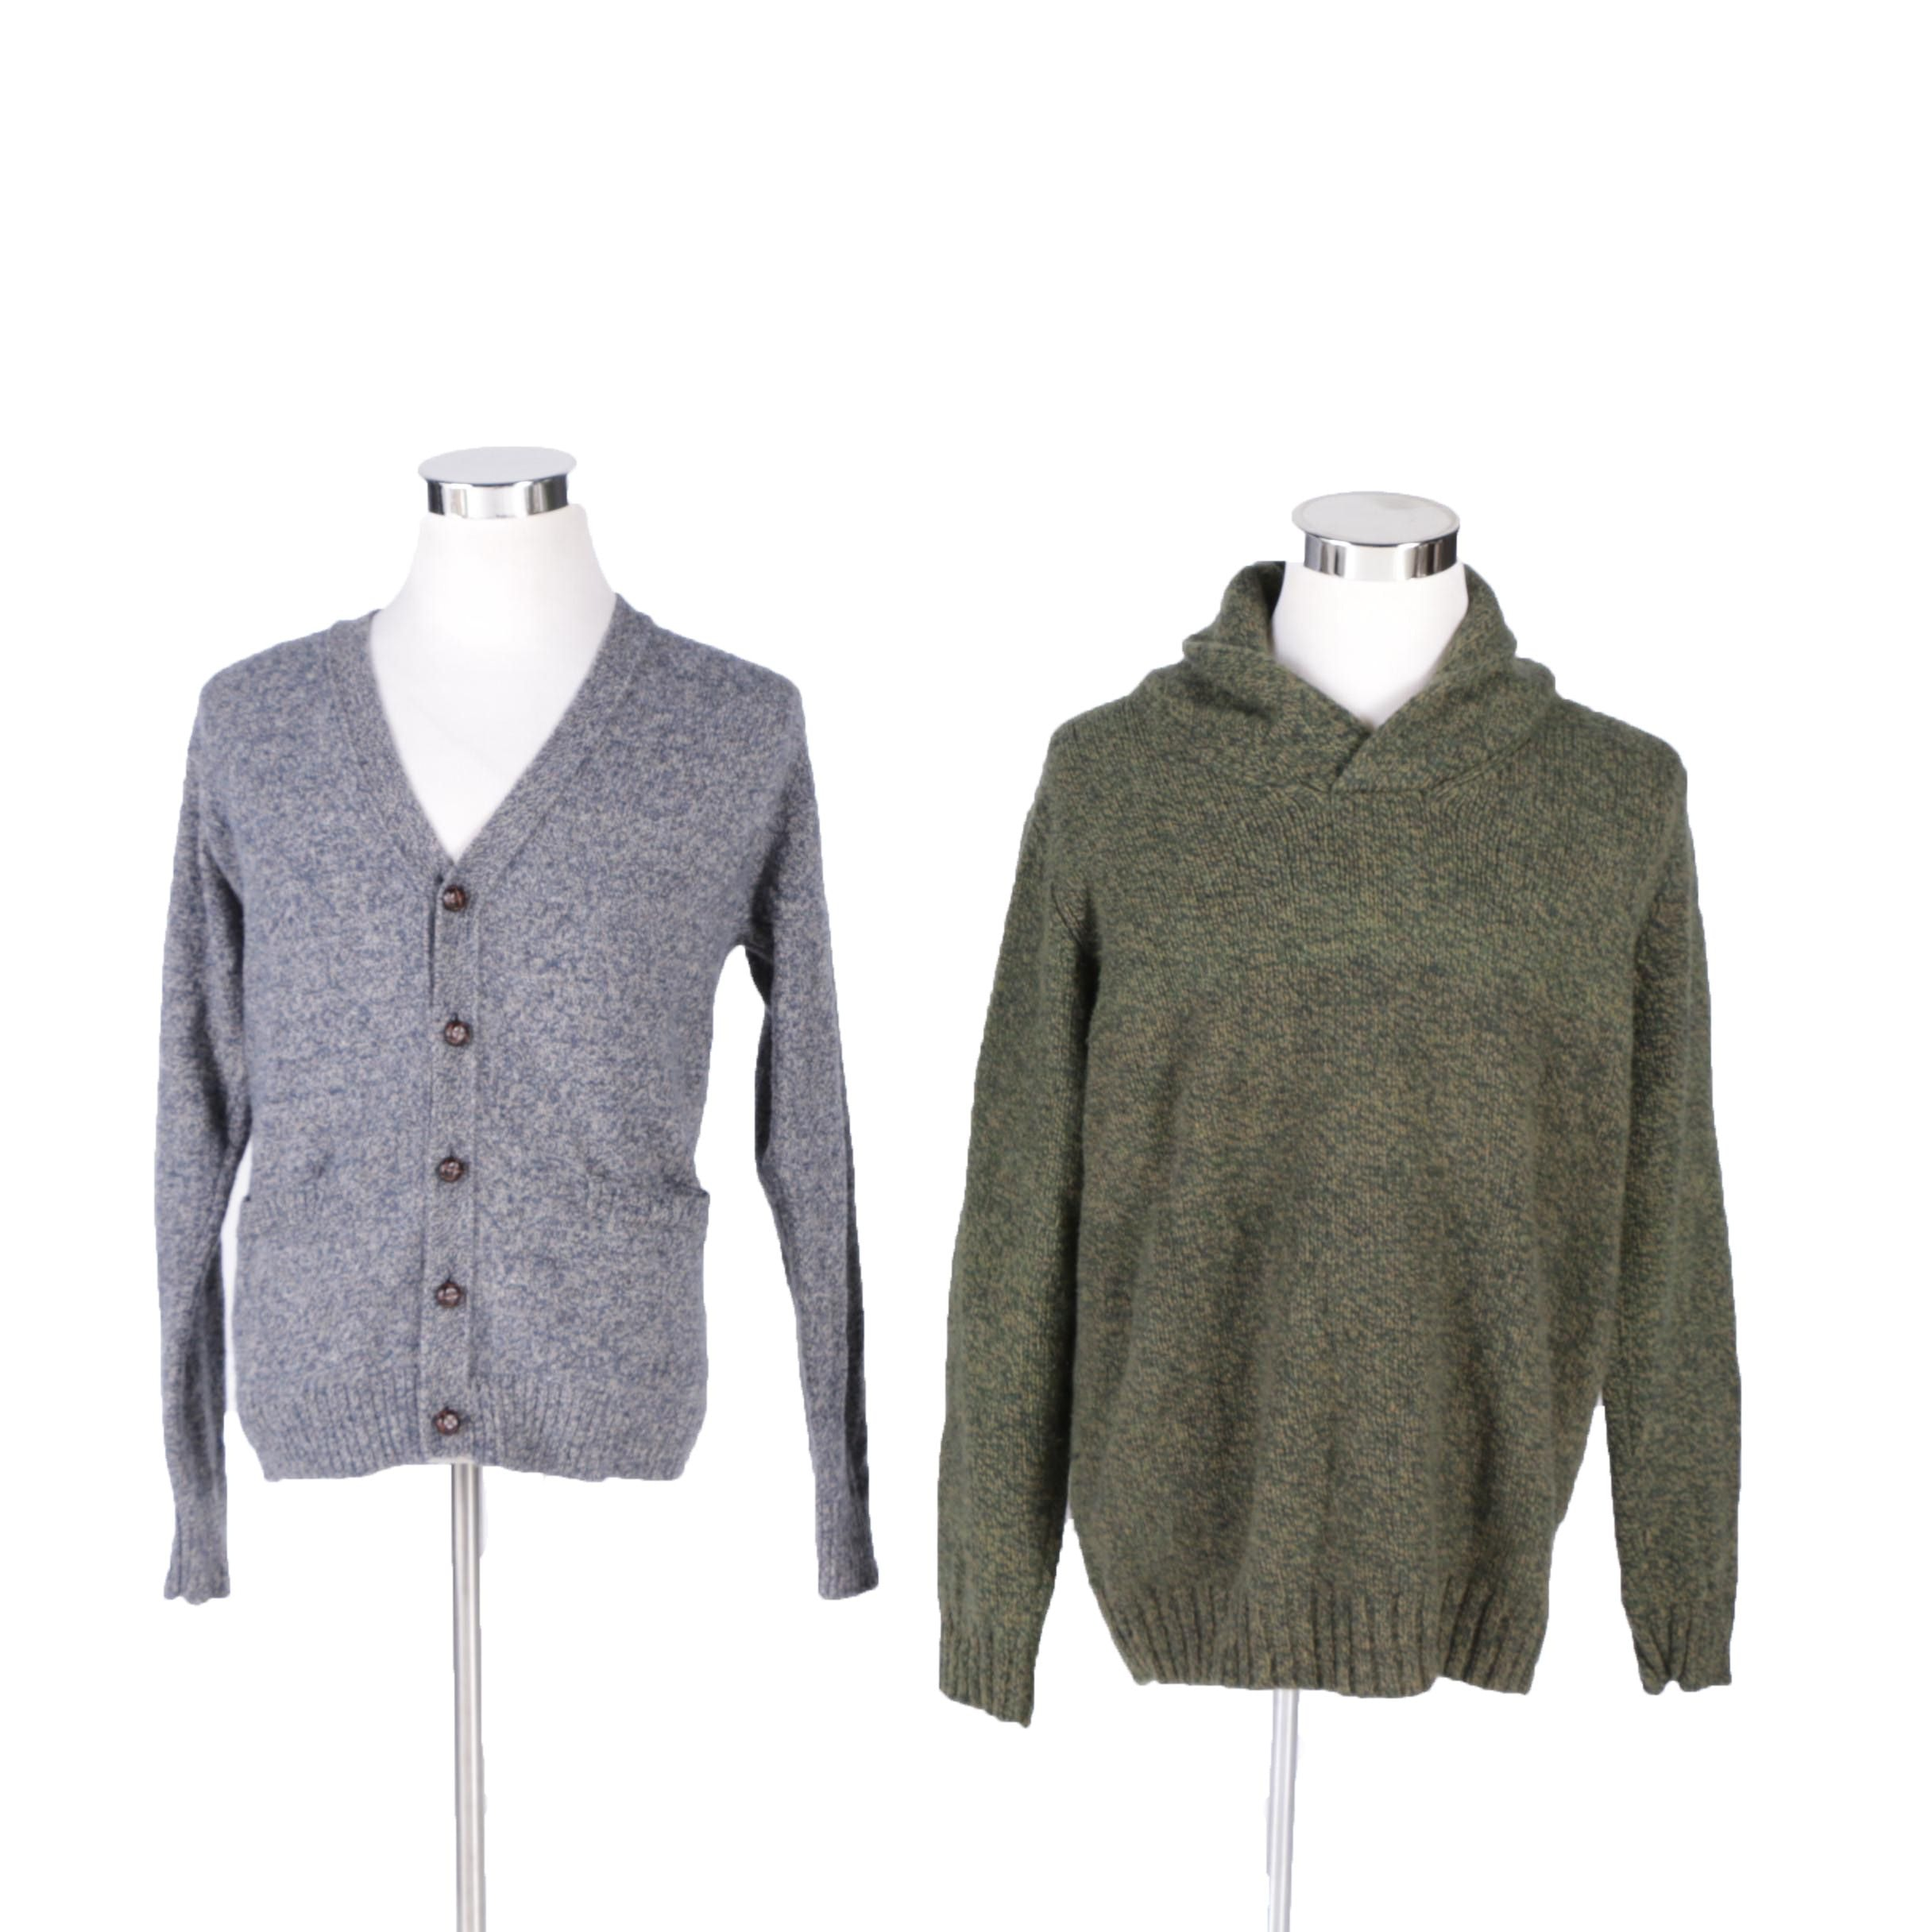 Men's Pendleton Grey Wool Cardigan and L.L. Bean Green Wool Pullover